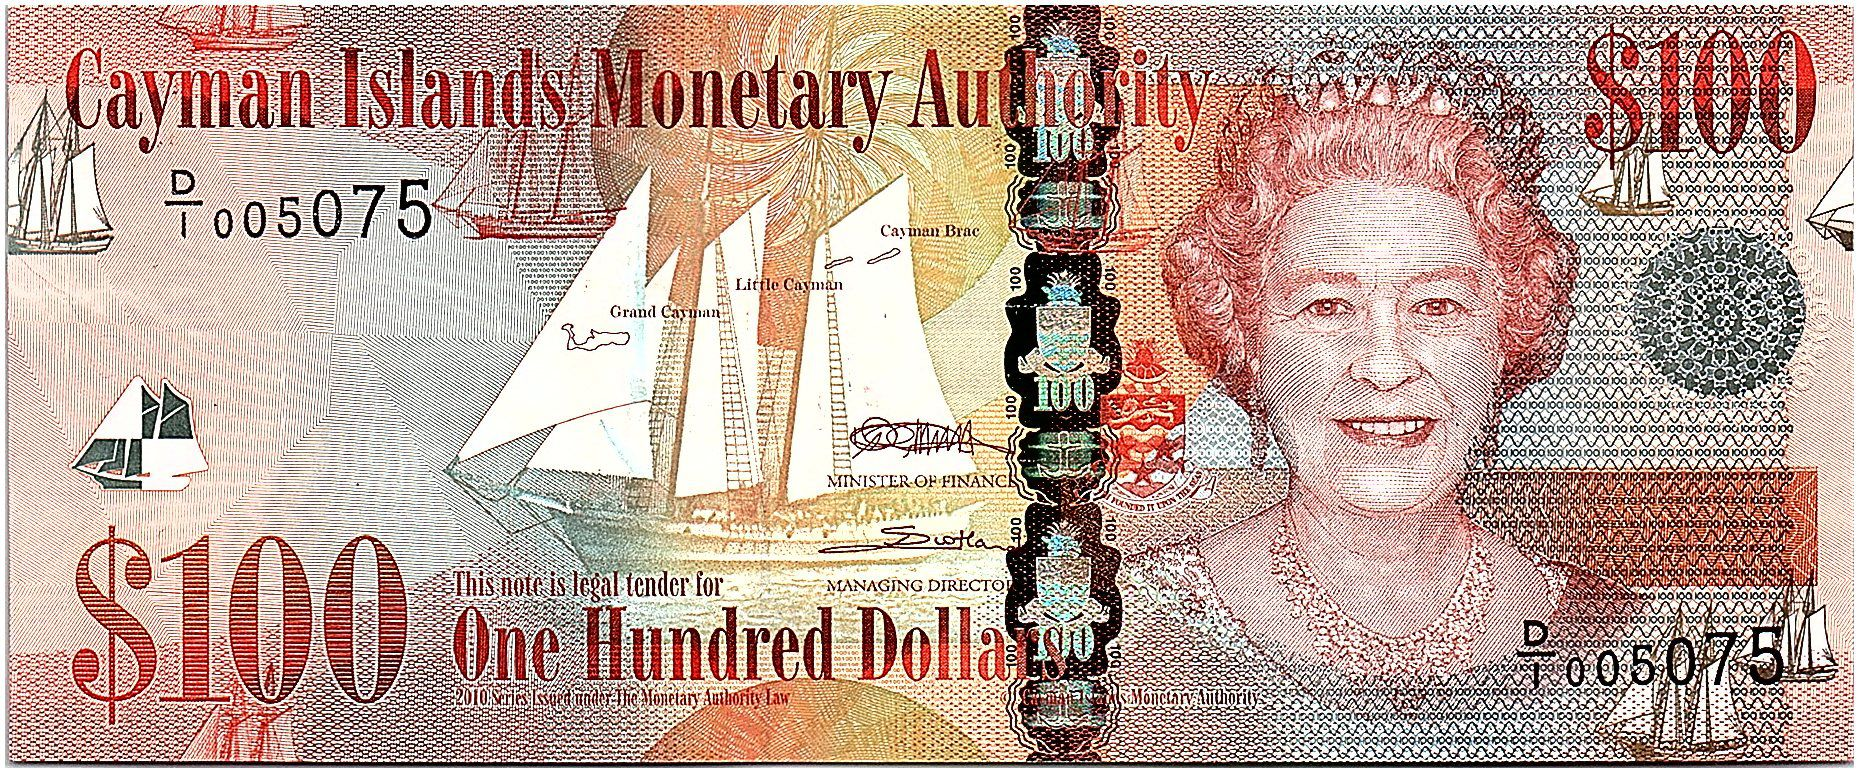 Cayman Islands 100 Dollars 2010 - Elizabeth II - UNC - P.43a